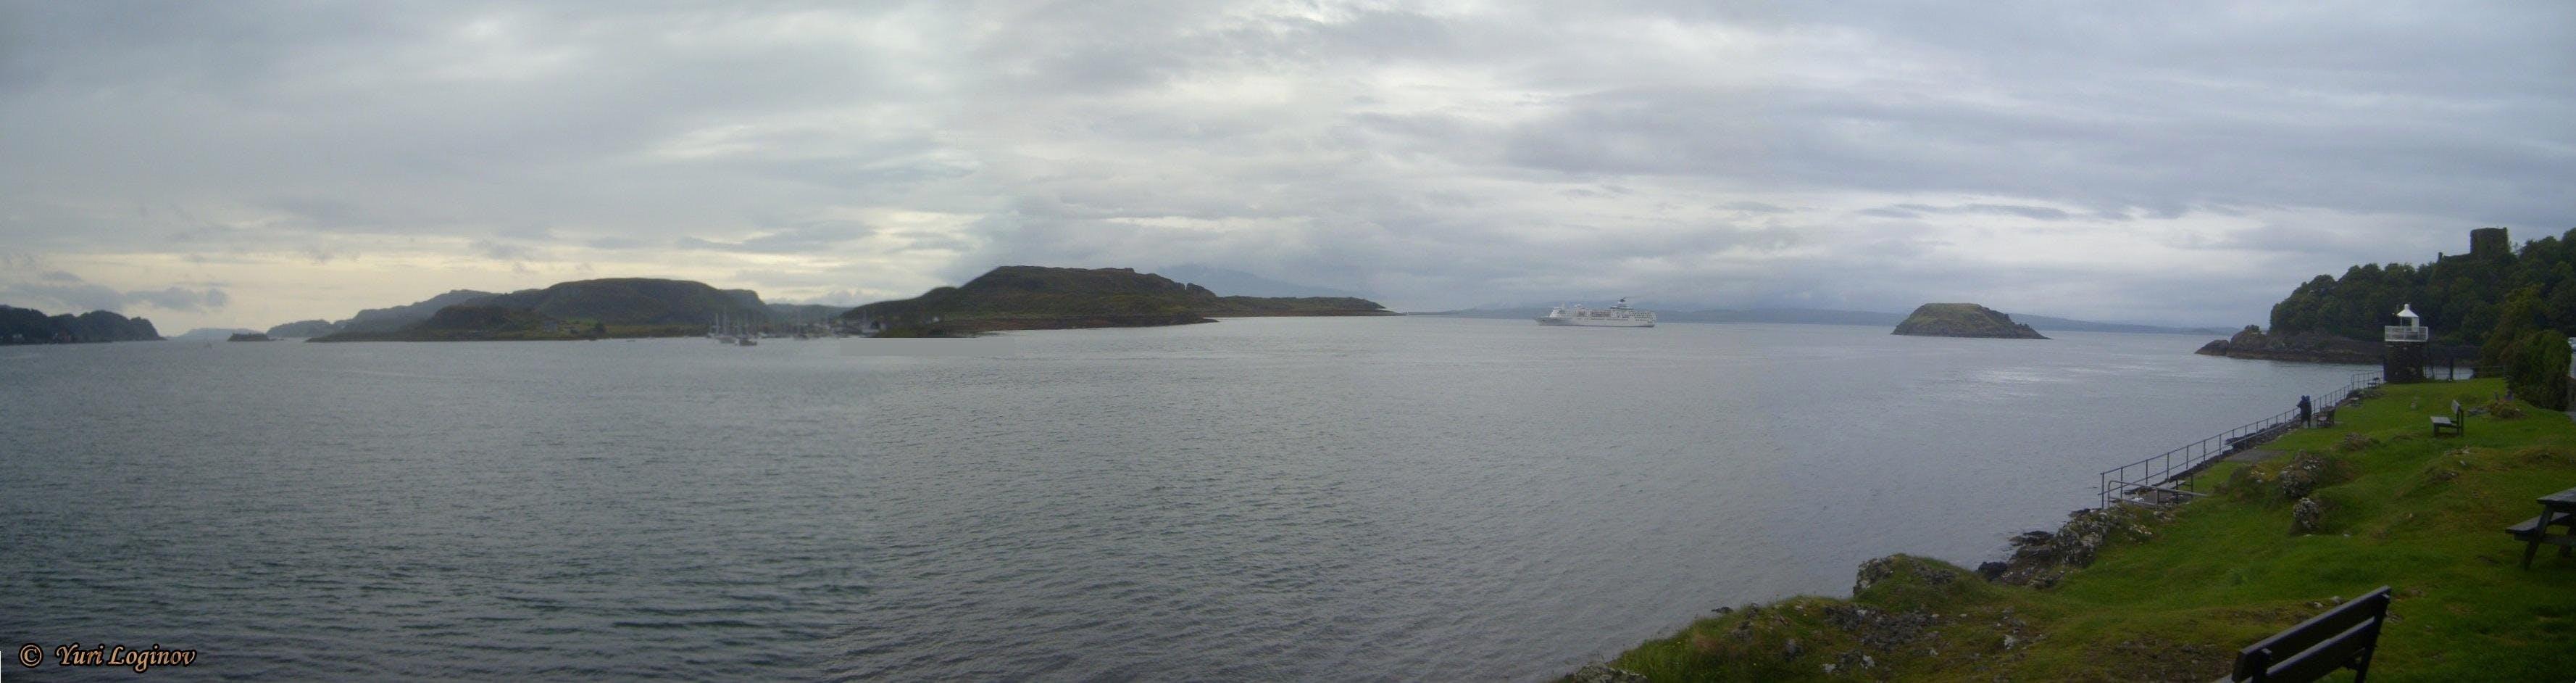 Free stock photo of Oban, scotland, united kingdom